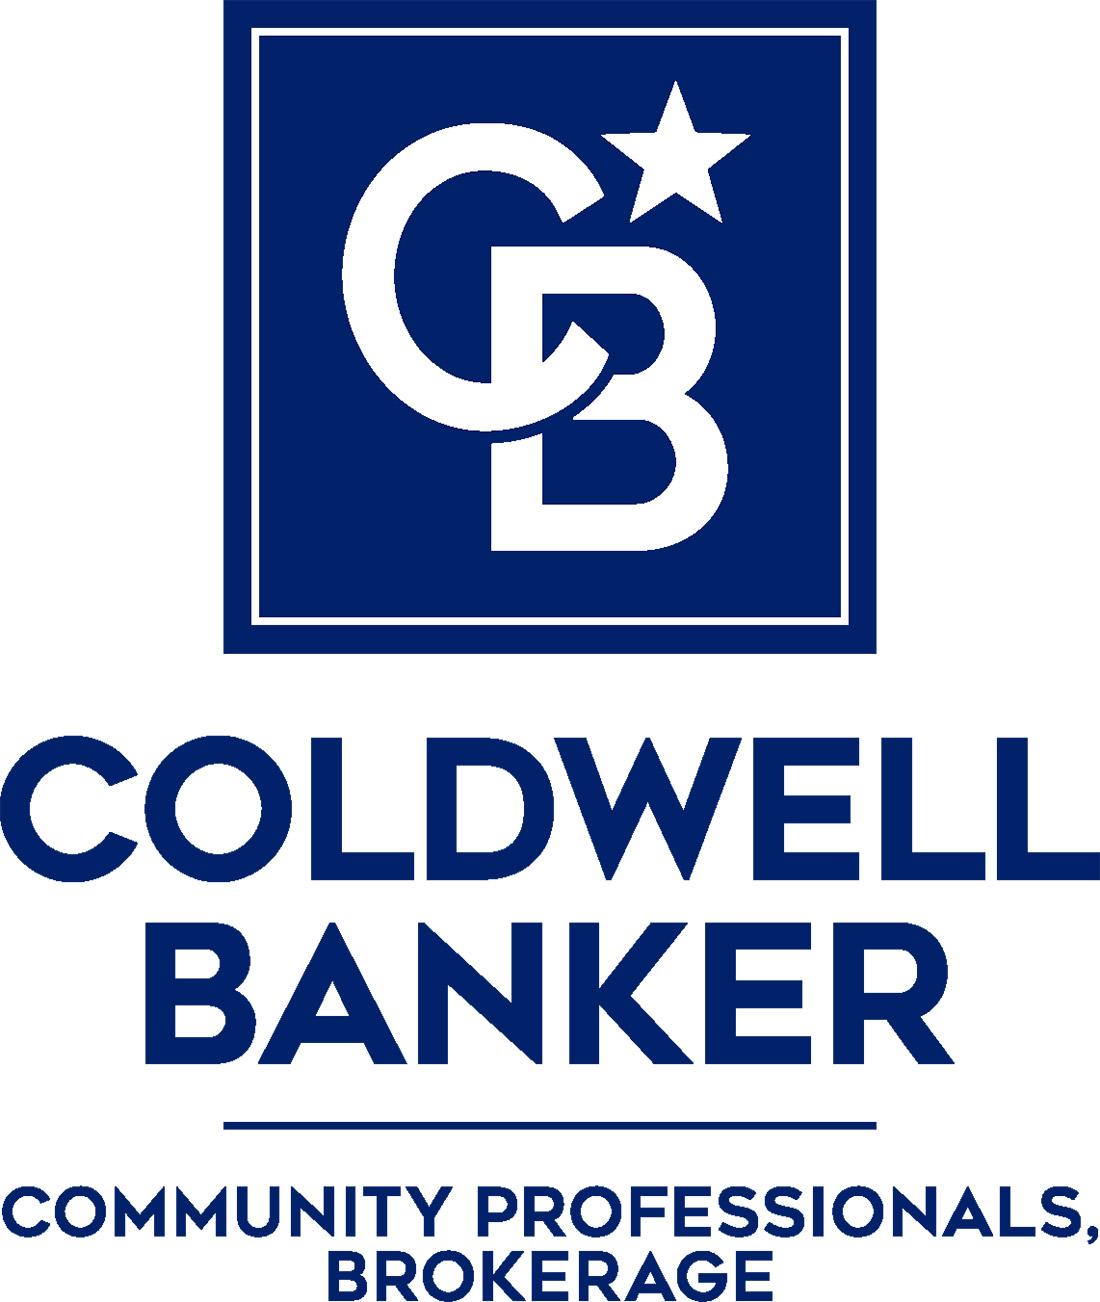 Ann Cosens - Coldwell Banker Community Professionals Logo